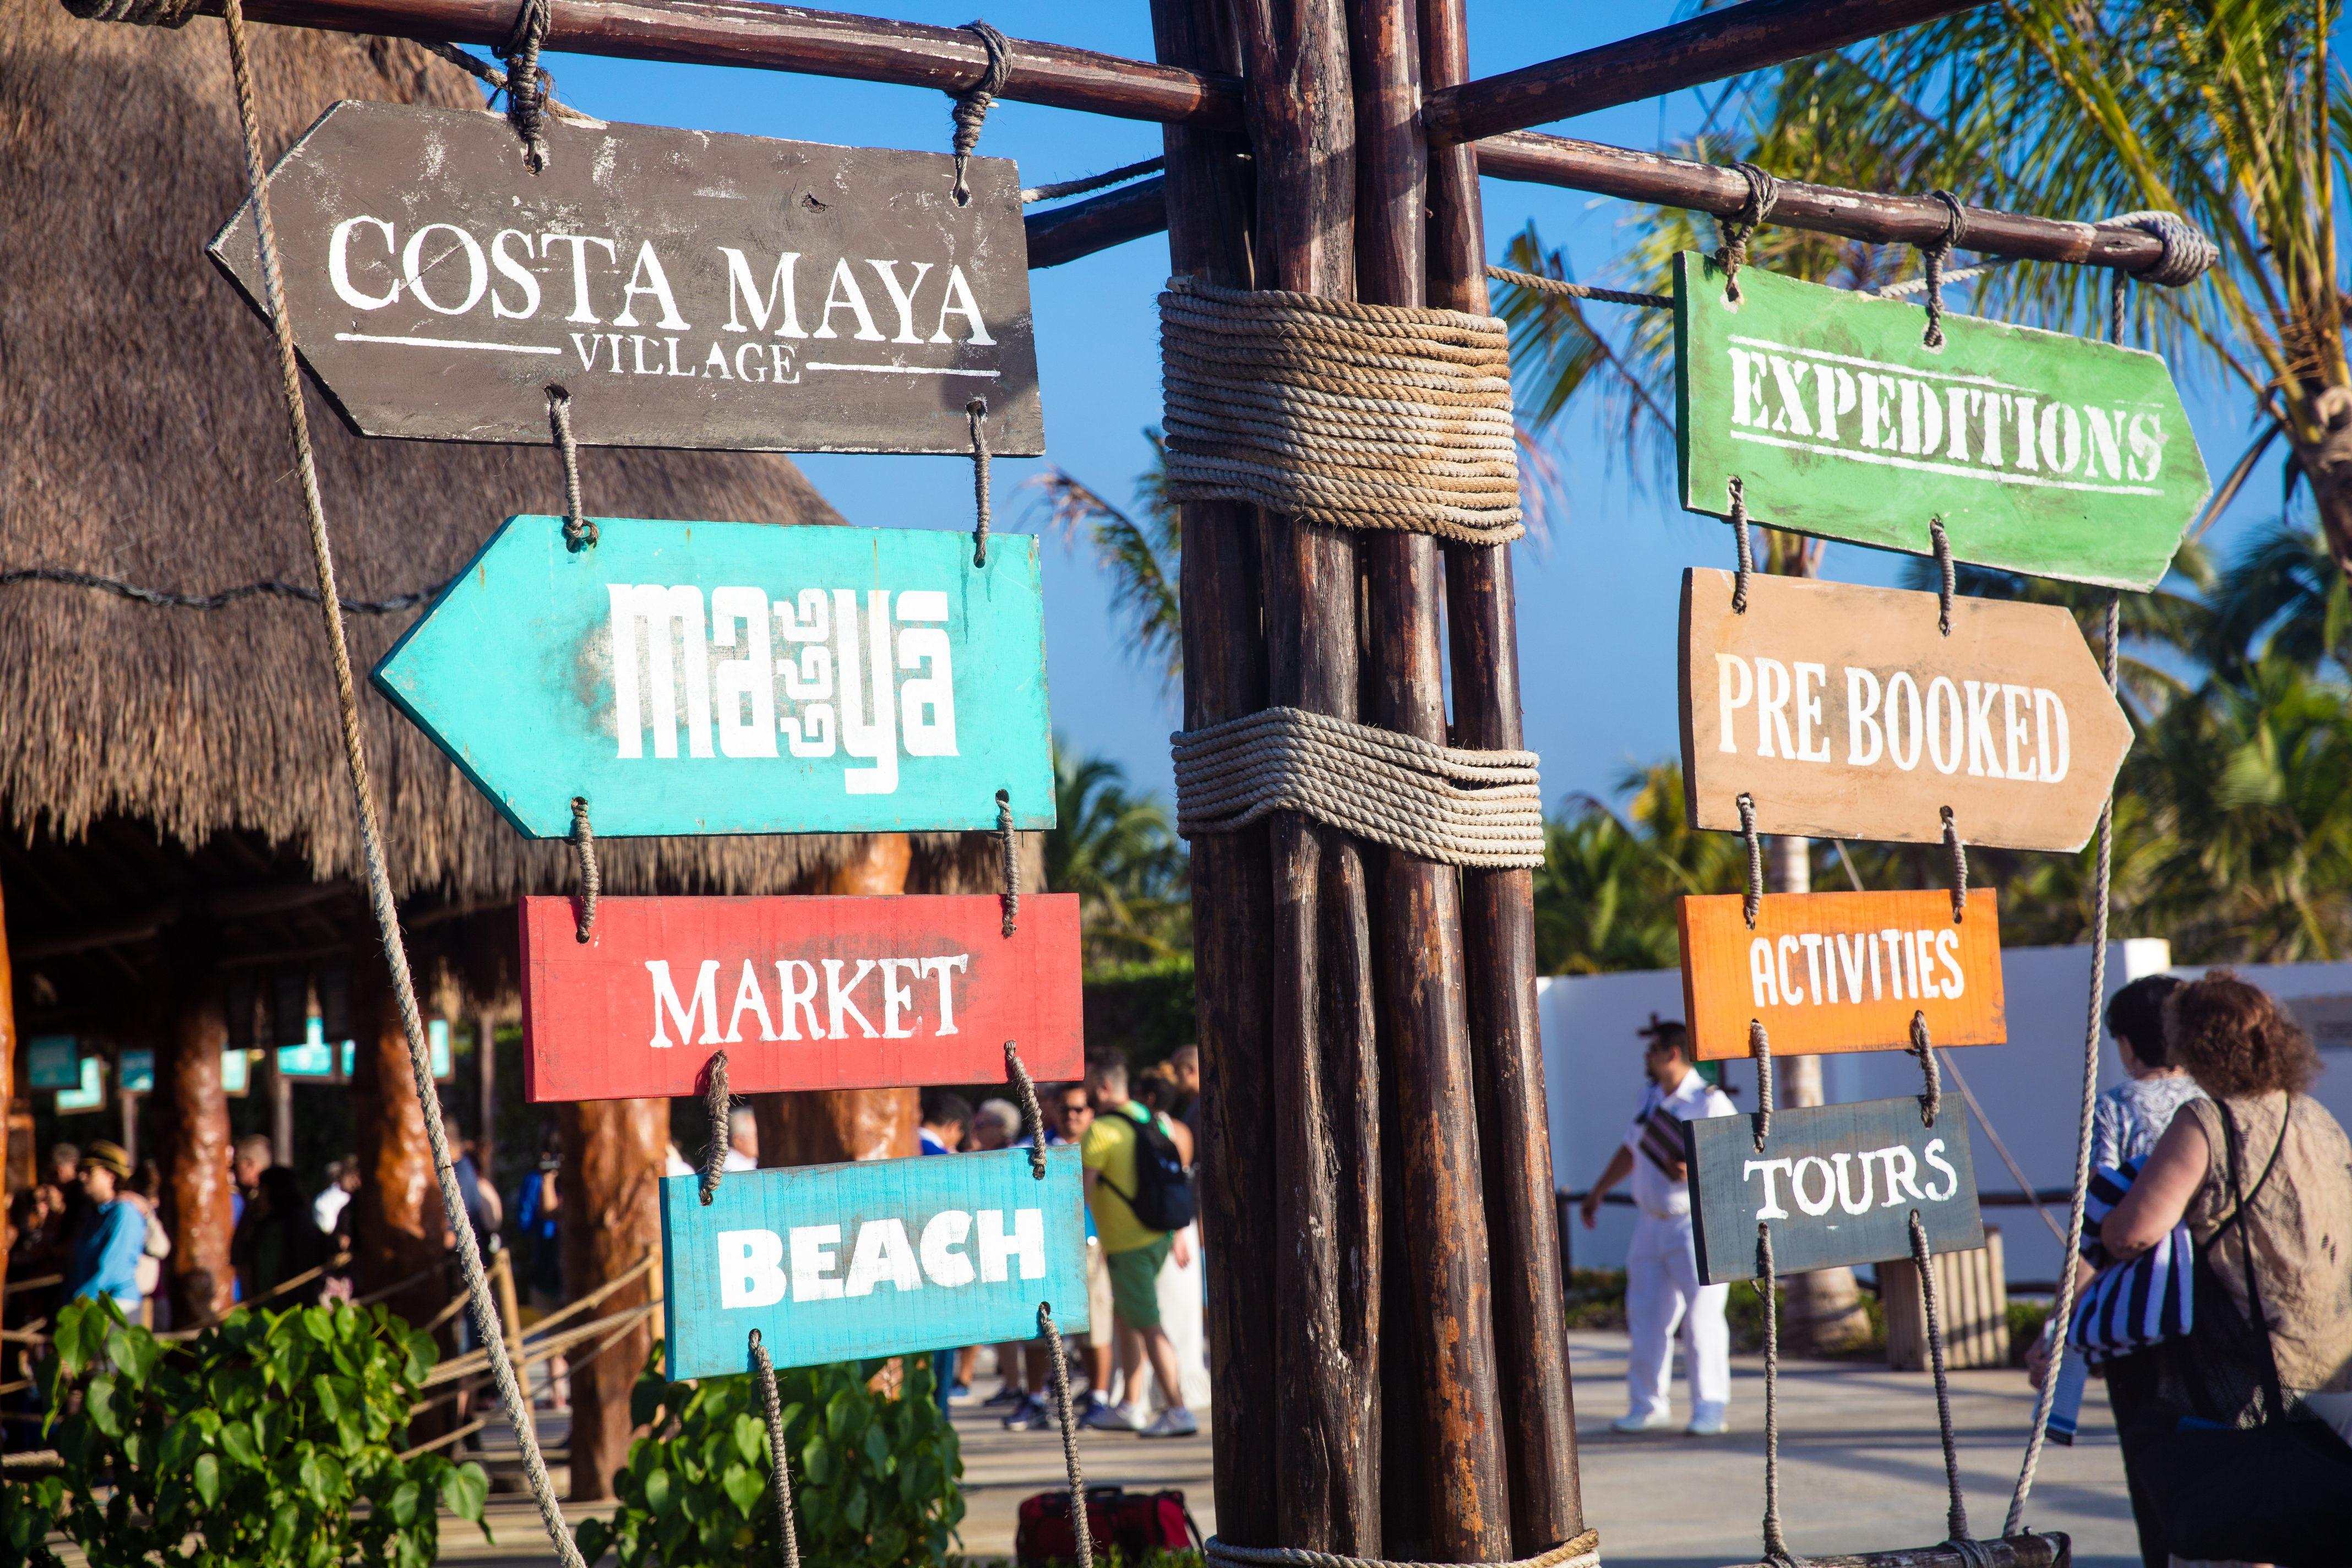 Costa Maya Port Sign